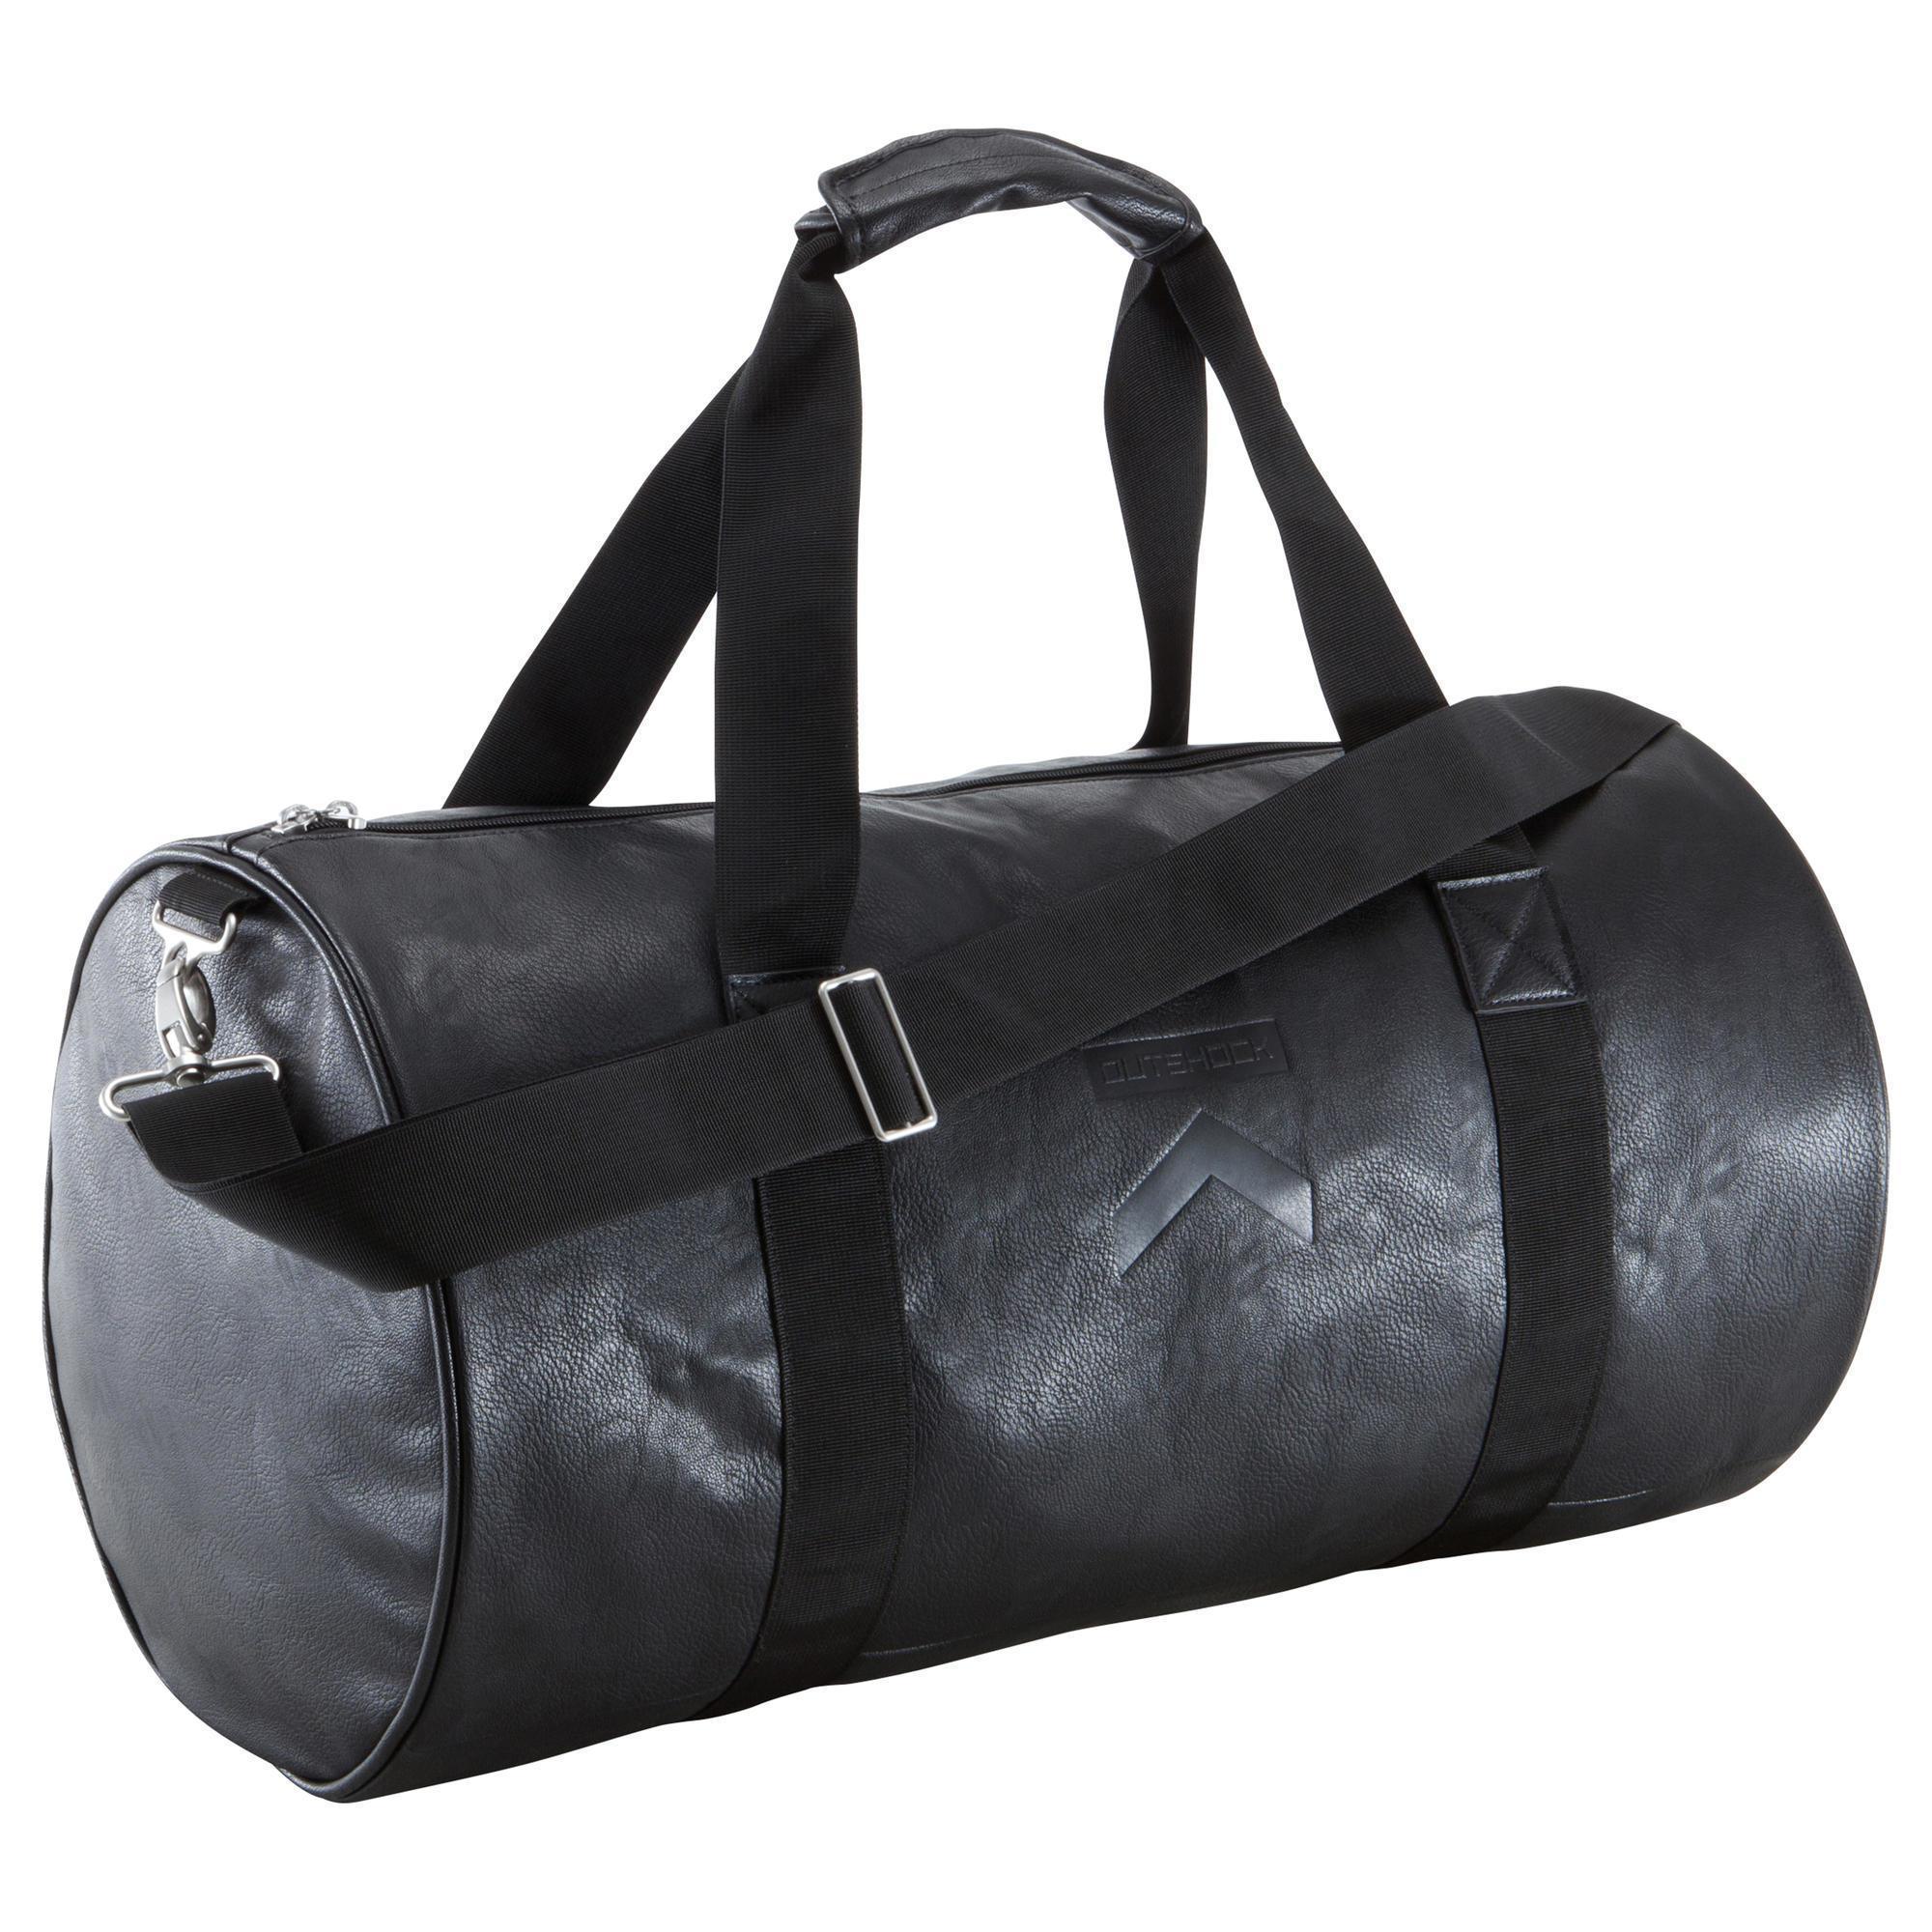 sac sports de combat 45 l noir domyos by decathlon. Black Bedroom Furniture Sets. Home Design Ideas